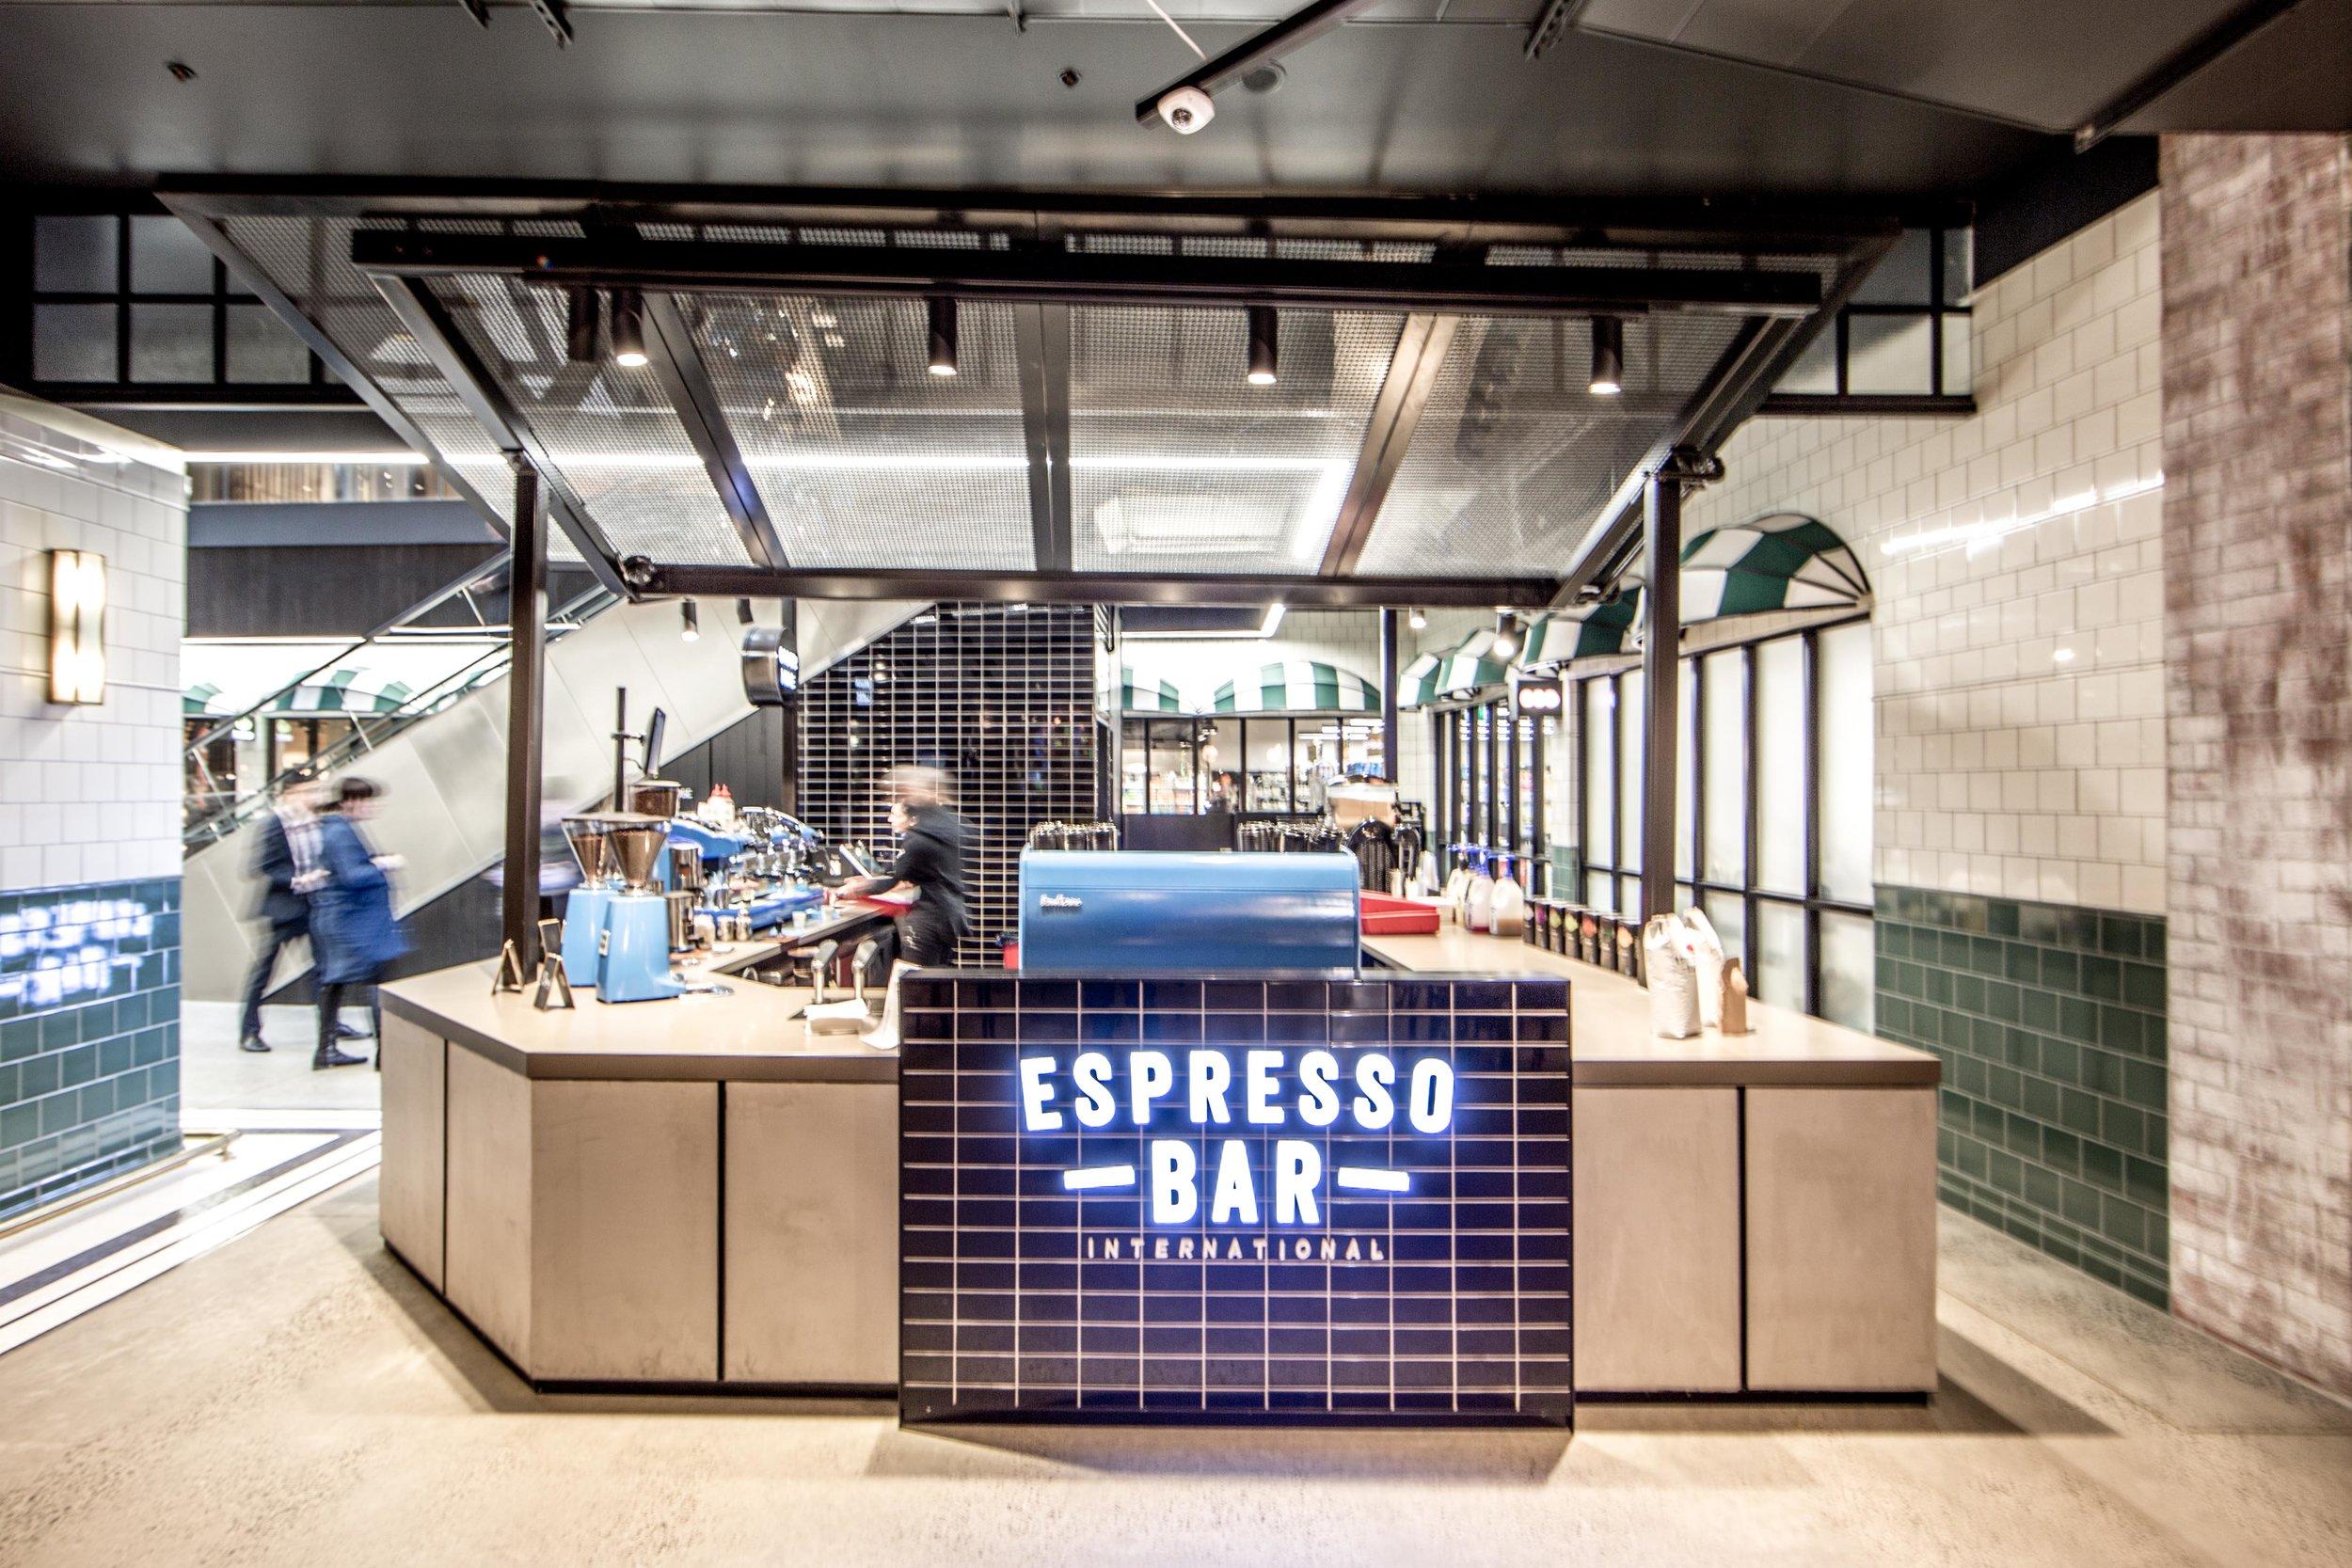 Espresso Bar Collins Sq-7.jpg